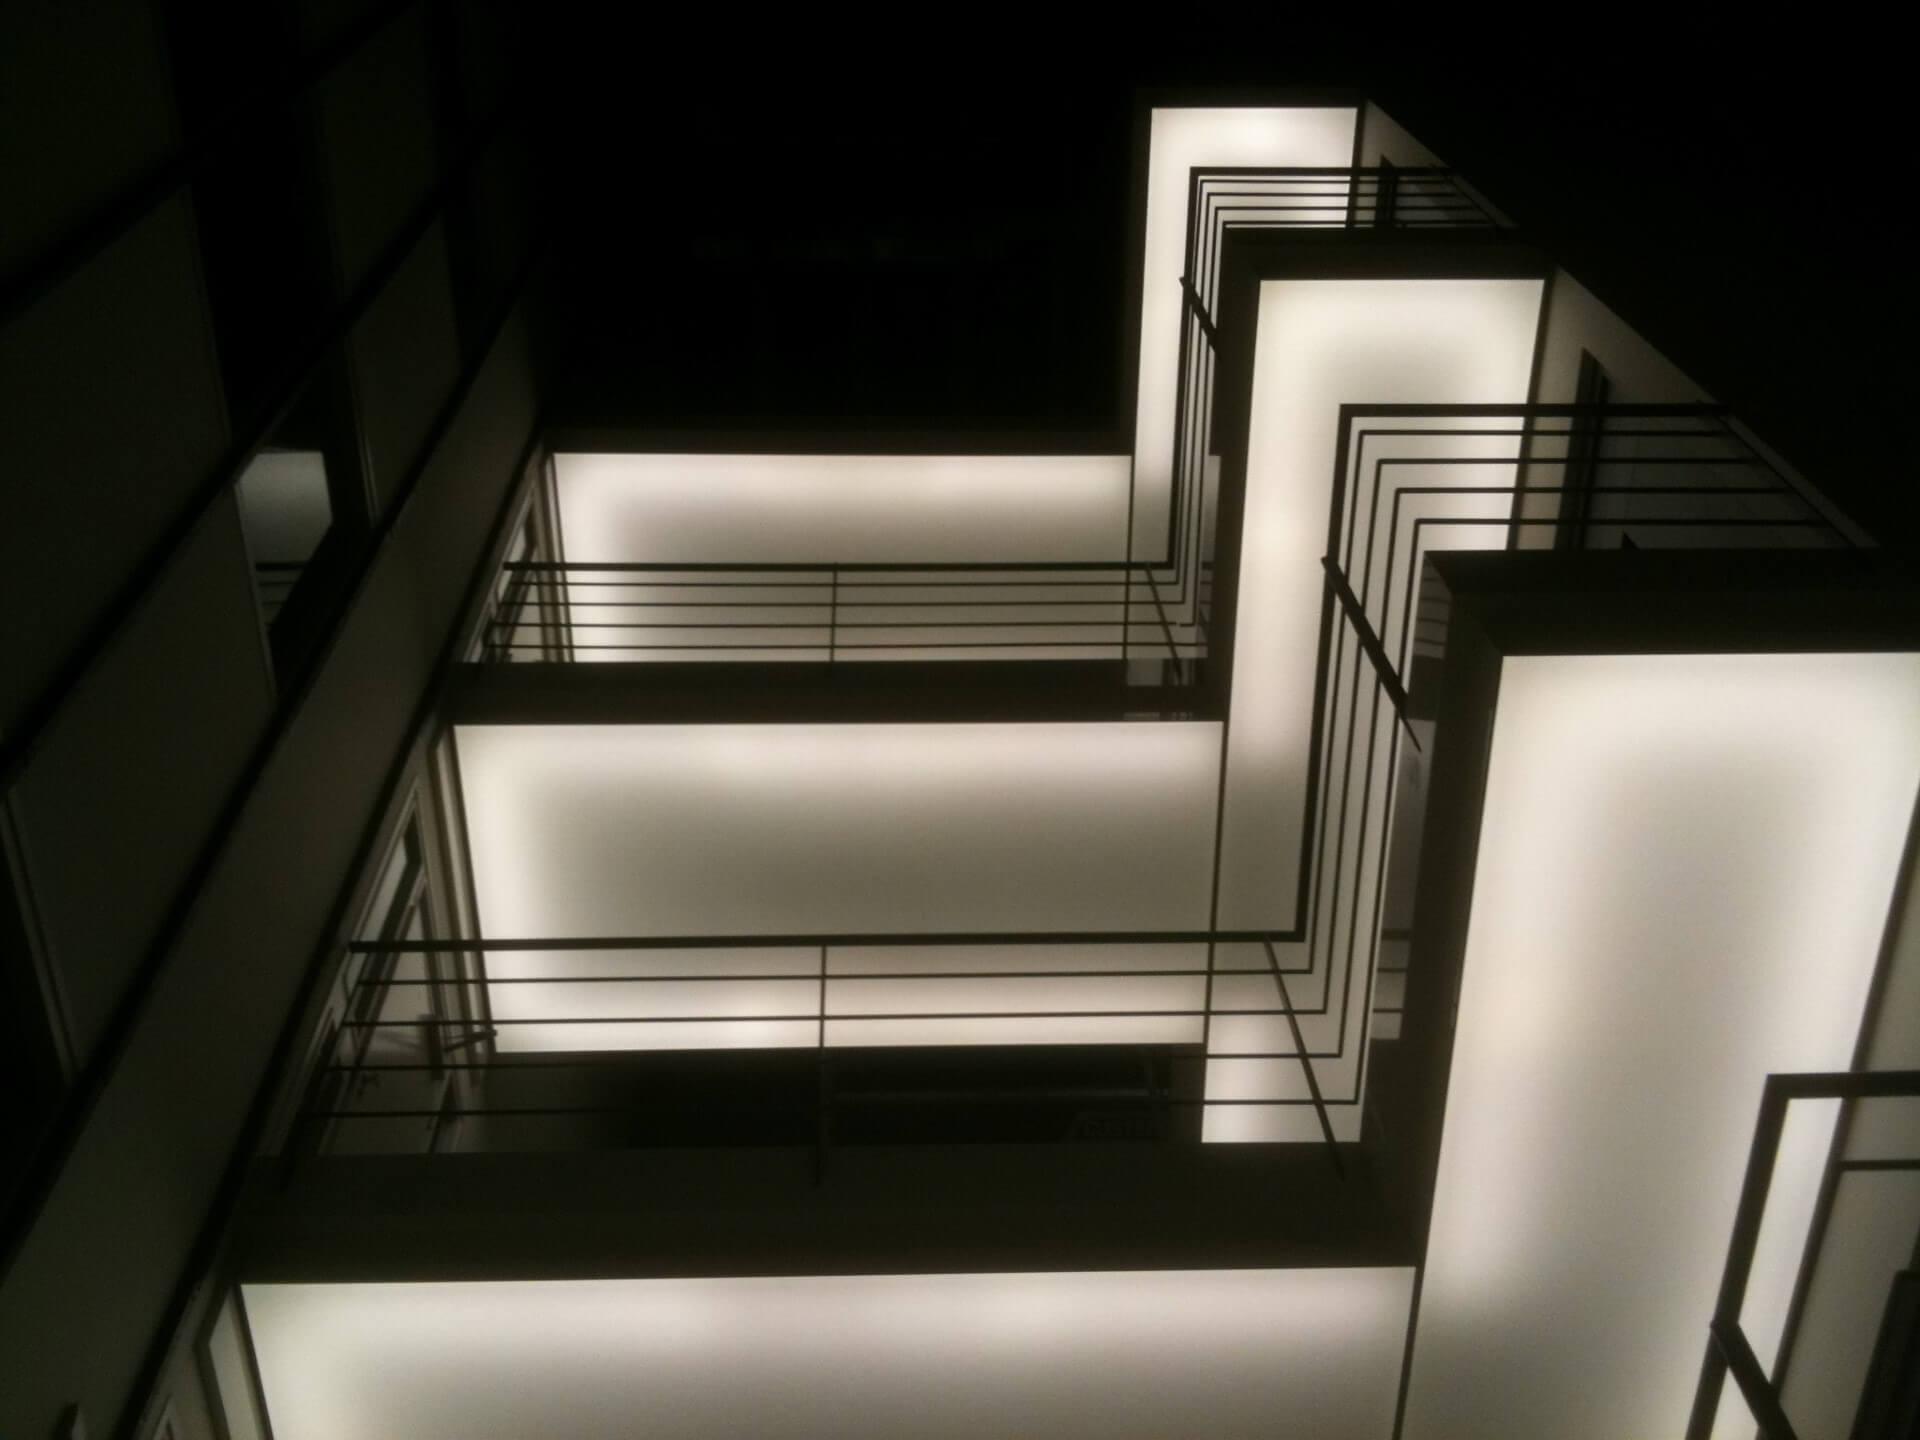 Lichtplafond06